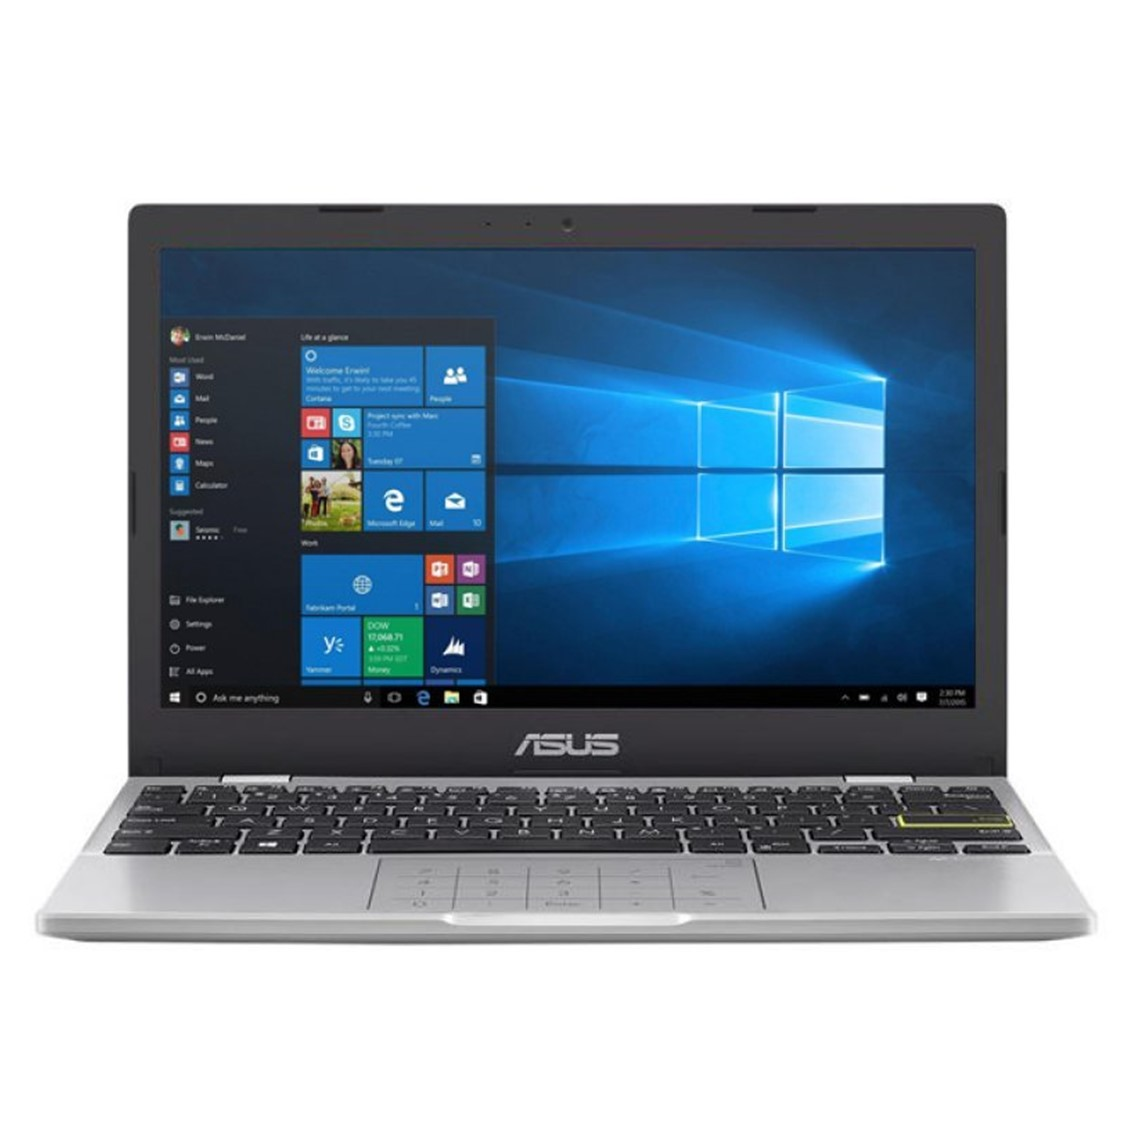 "PORTATIL ASUS E210MA-GJ003R CEL N4020 11.6"" 4GB / EMMC64GB / WIFI / BT / W10PRO ACADEMIC"